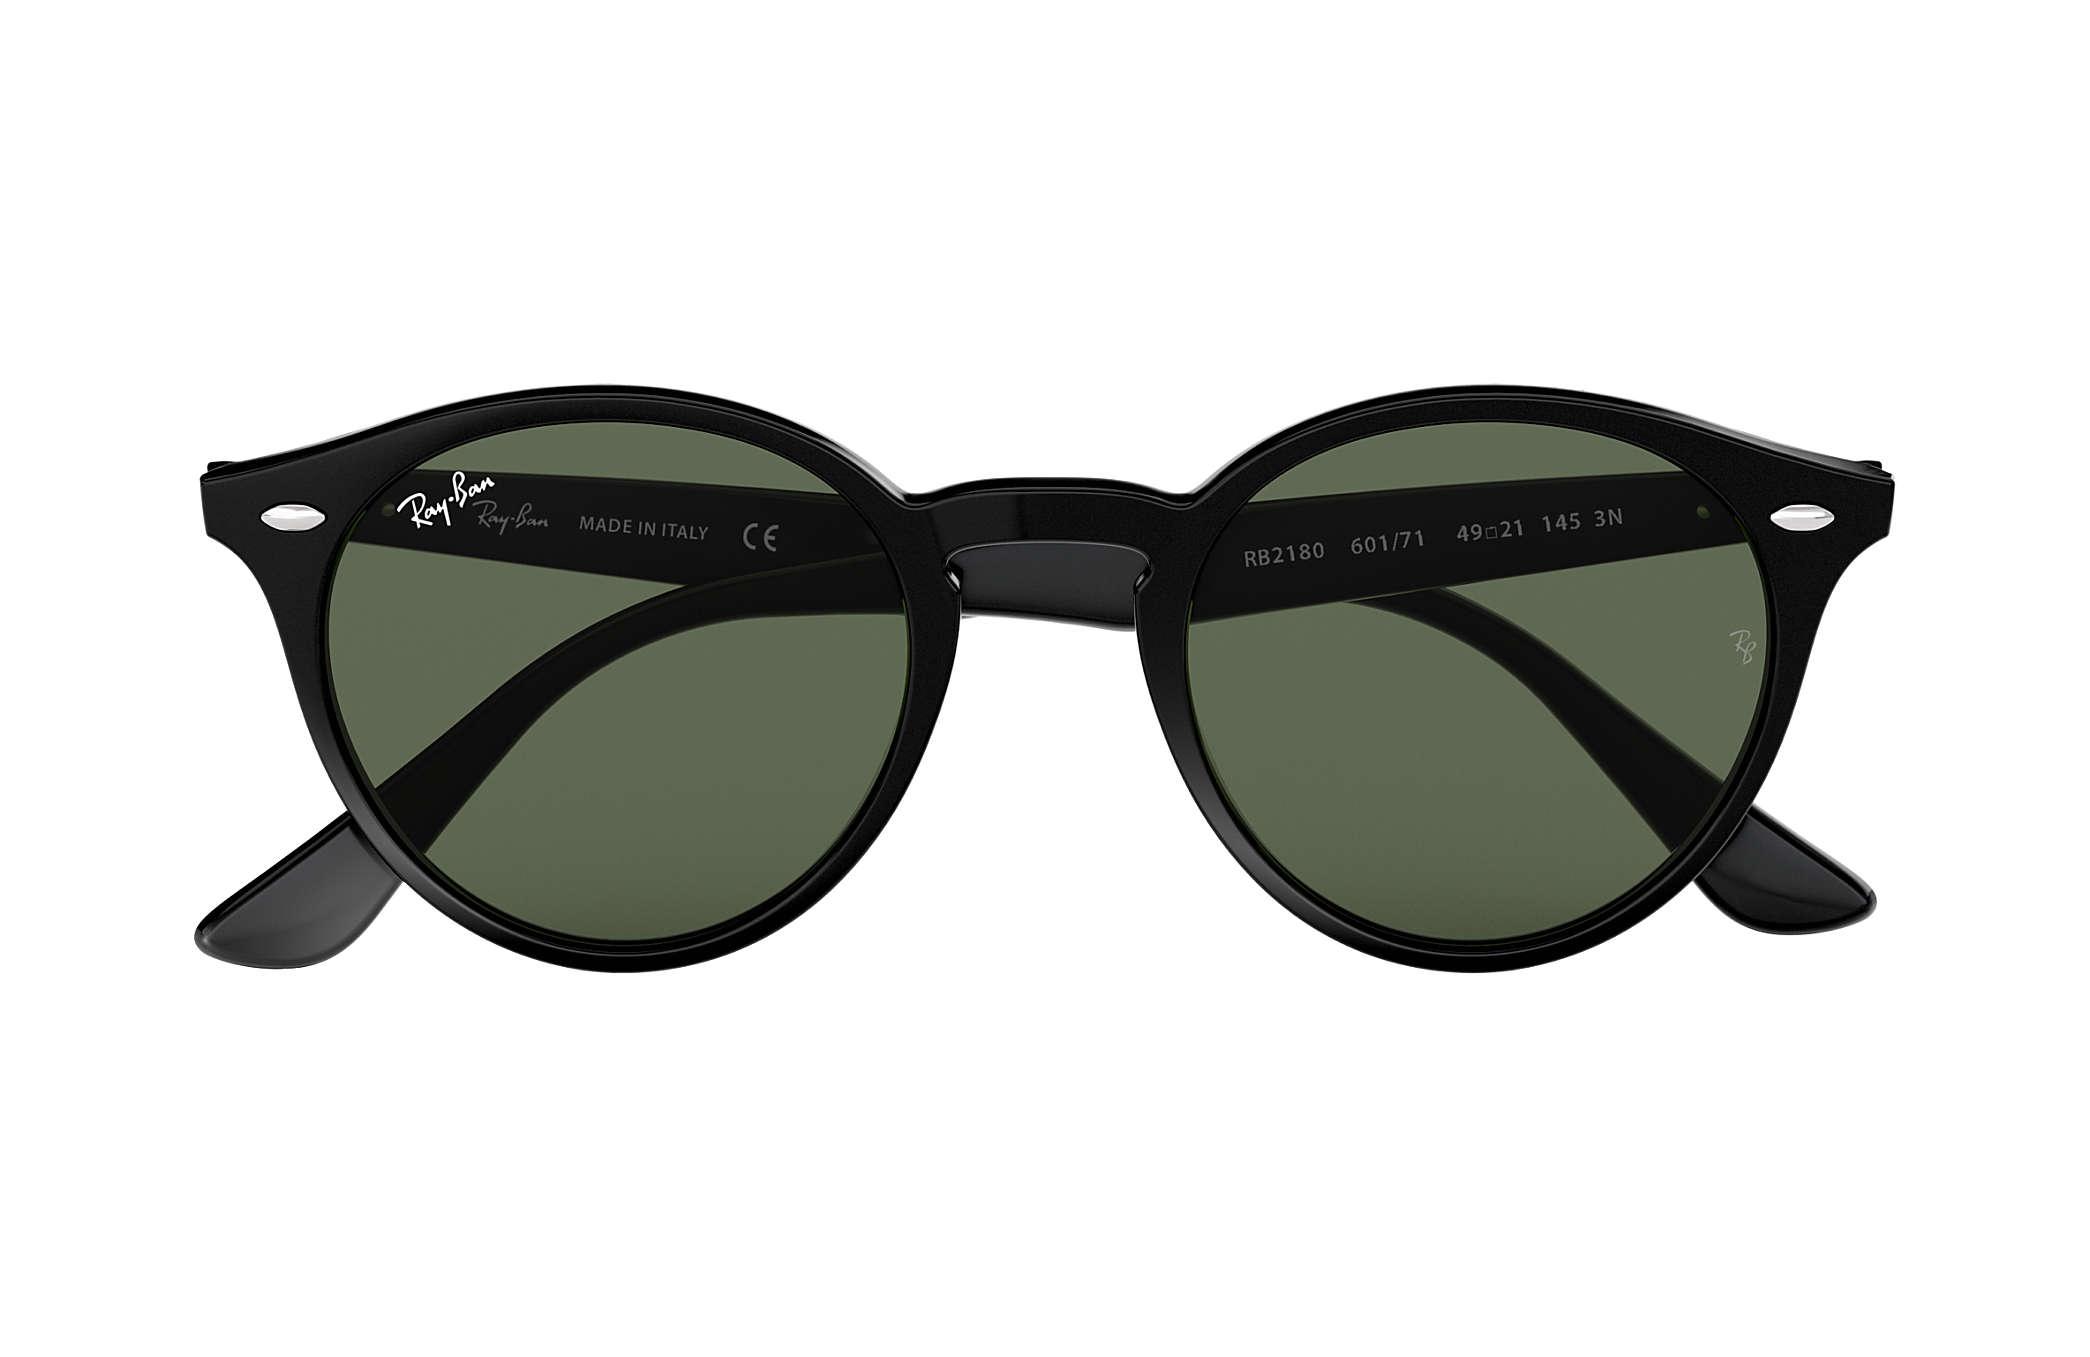 72655e6103150e Ray-Ban RB2180 Black - Acetate - Green Lenses - 0RB2180601 7149 ...